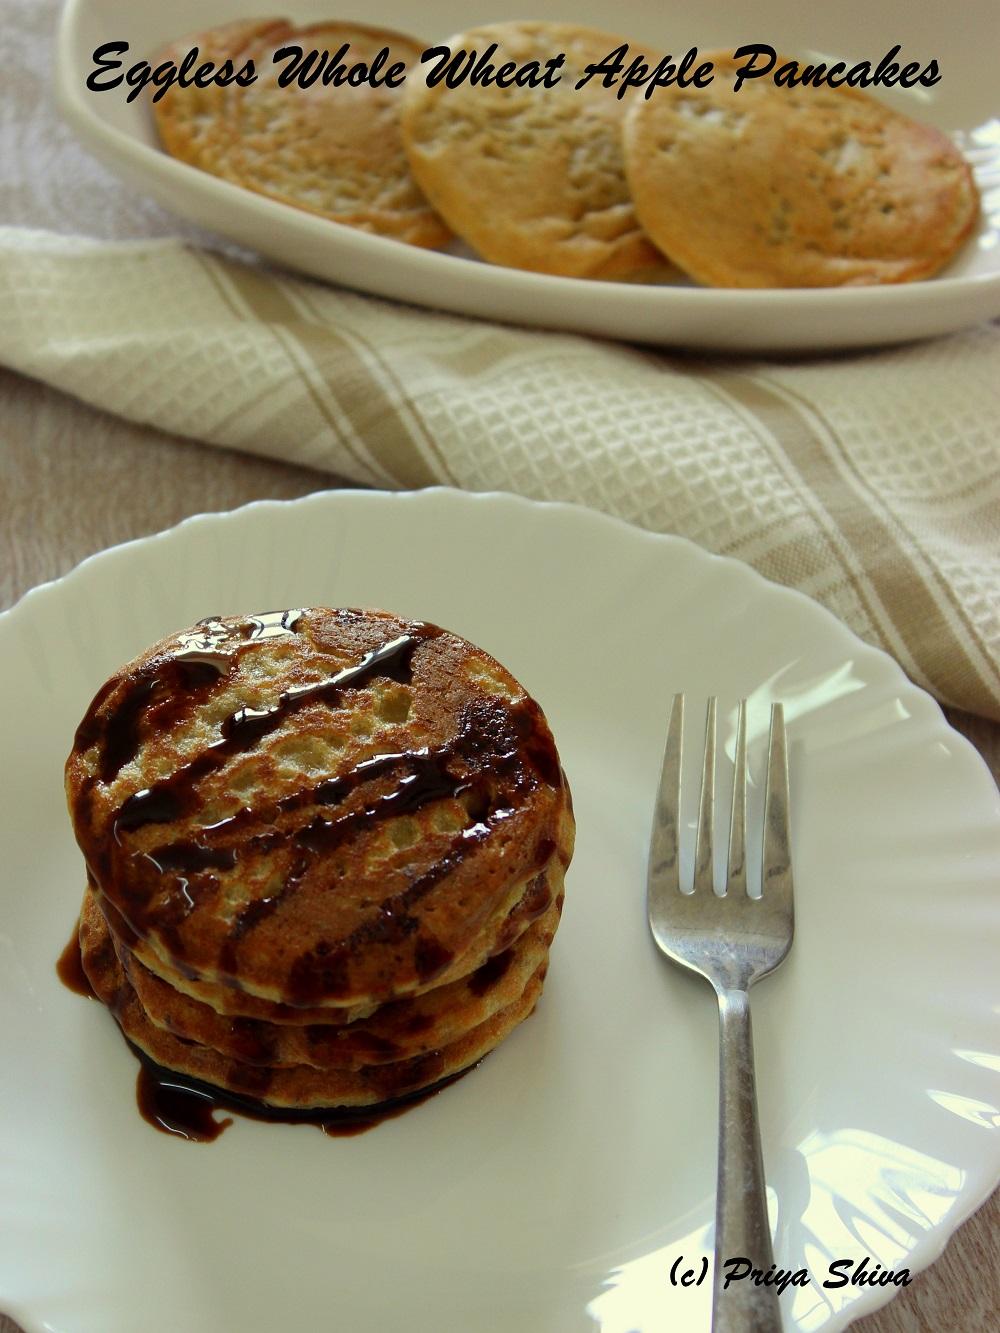 whole wheat apple pancakes